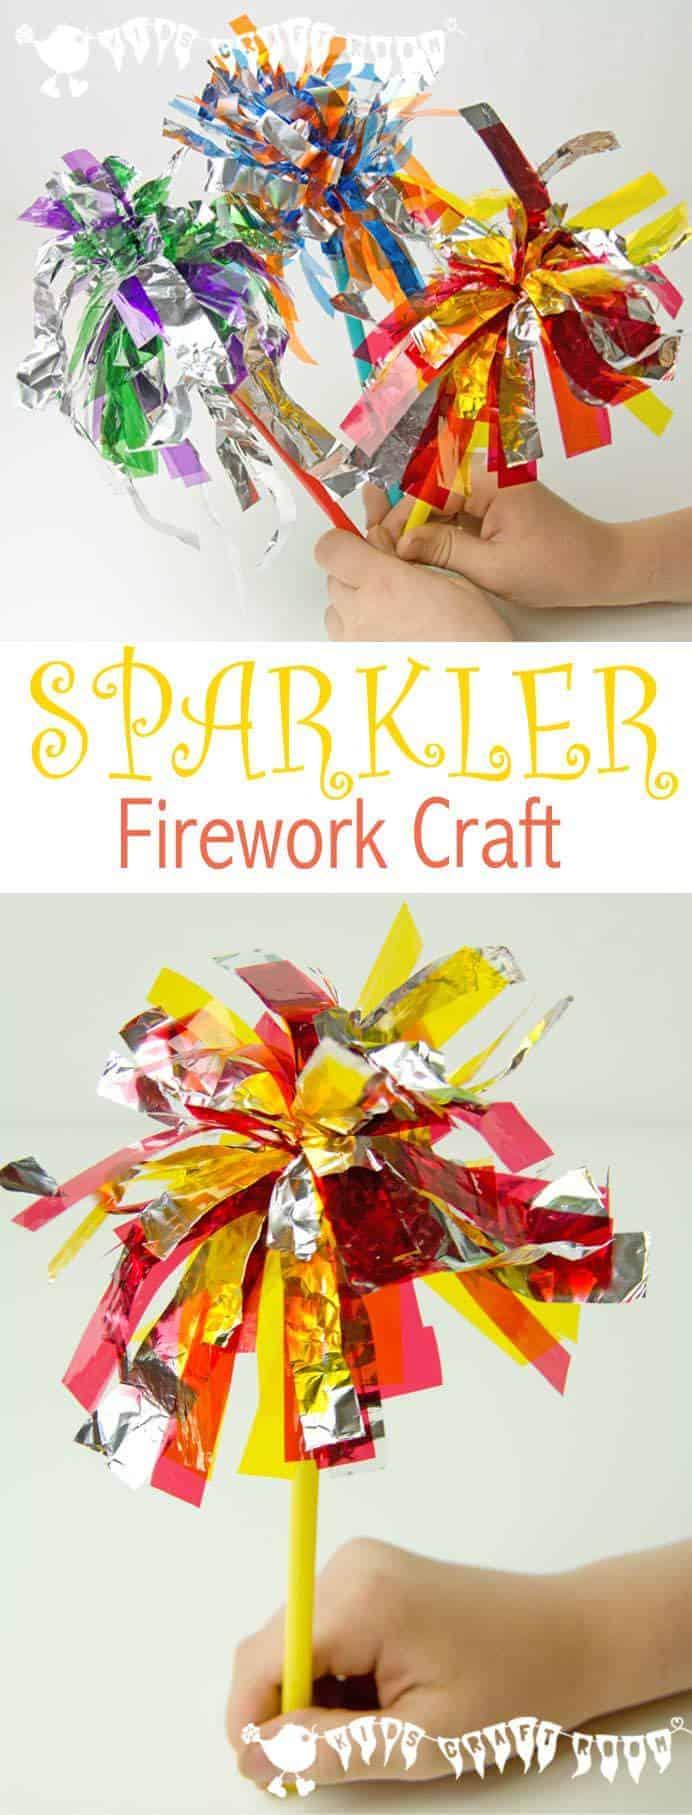 Uncategorized Kids Craft sparkler firework craft for kids room my children love fireworks but as a mum i find them bit scary and